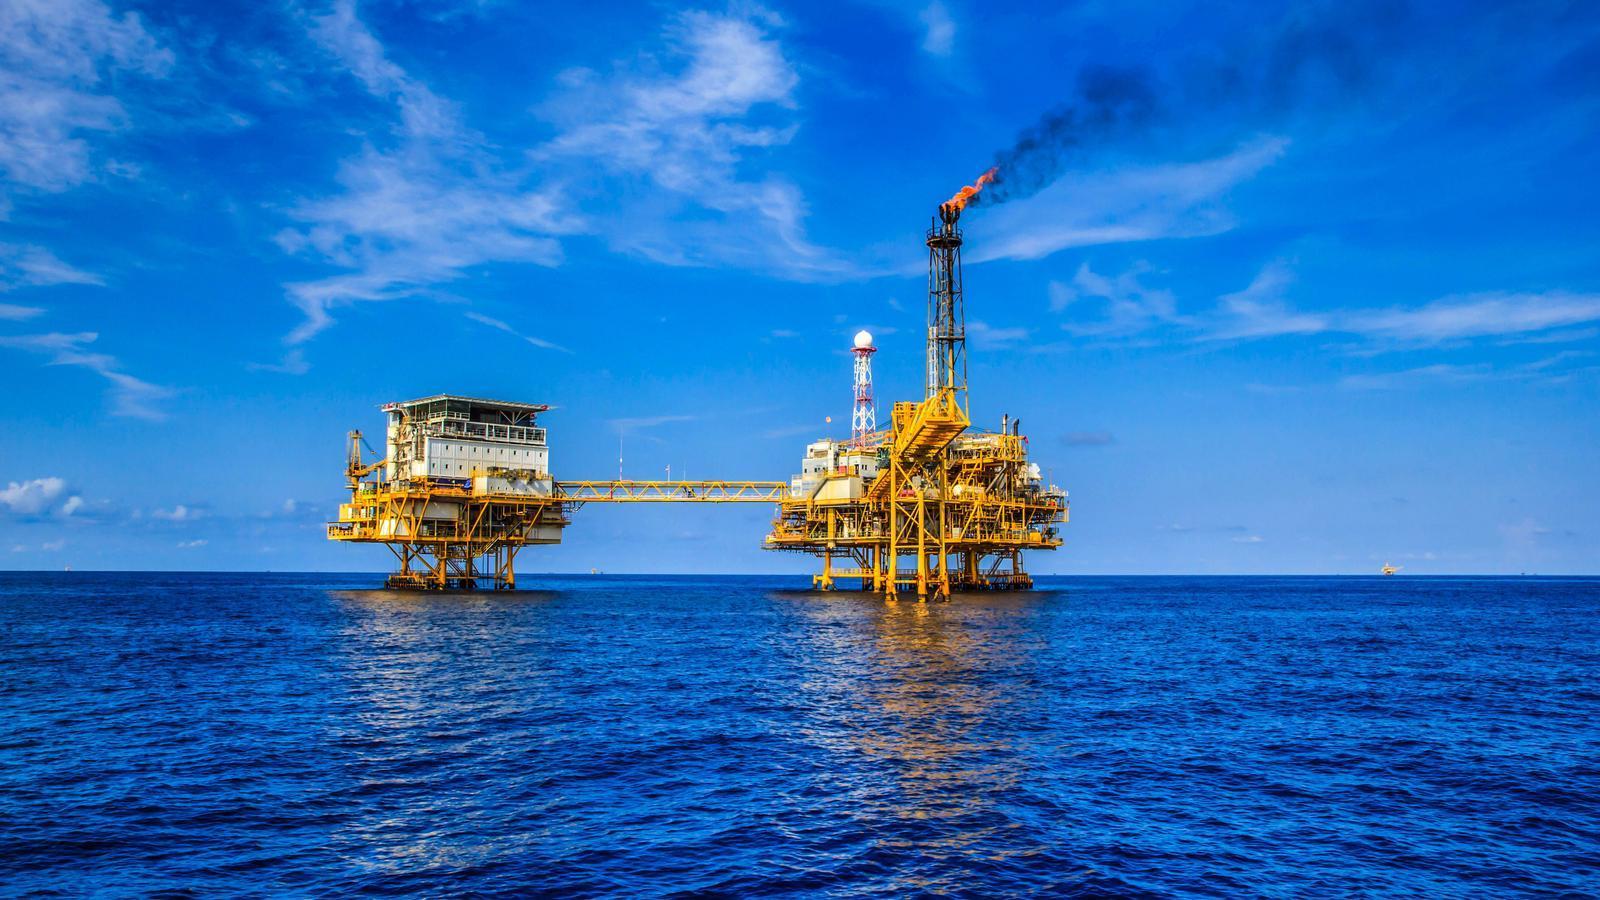 Plataforma de gas i petroli